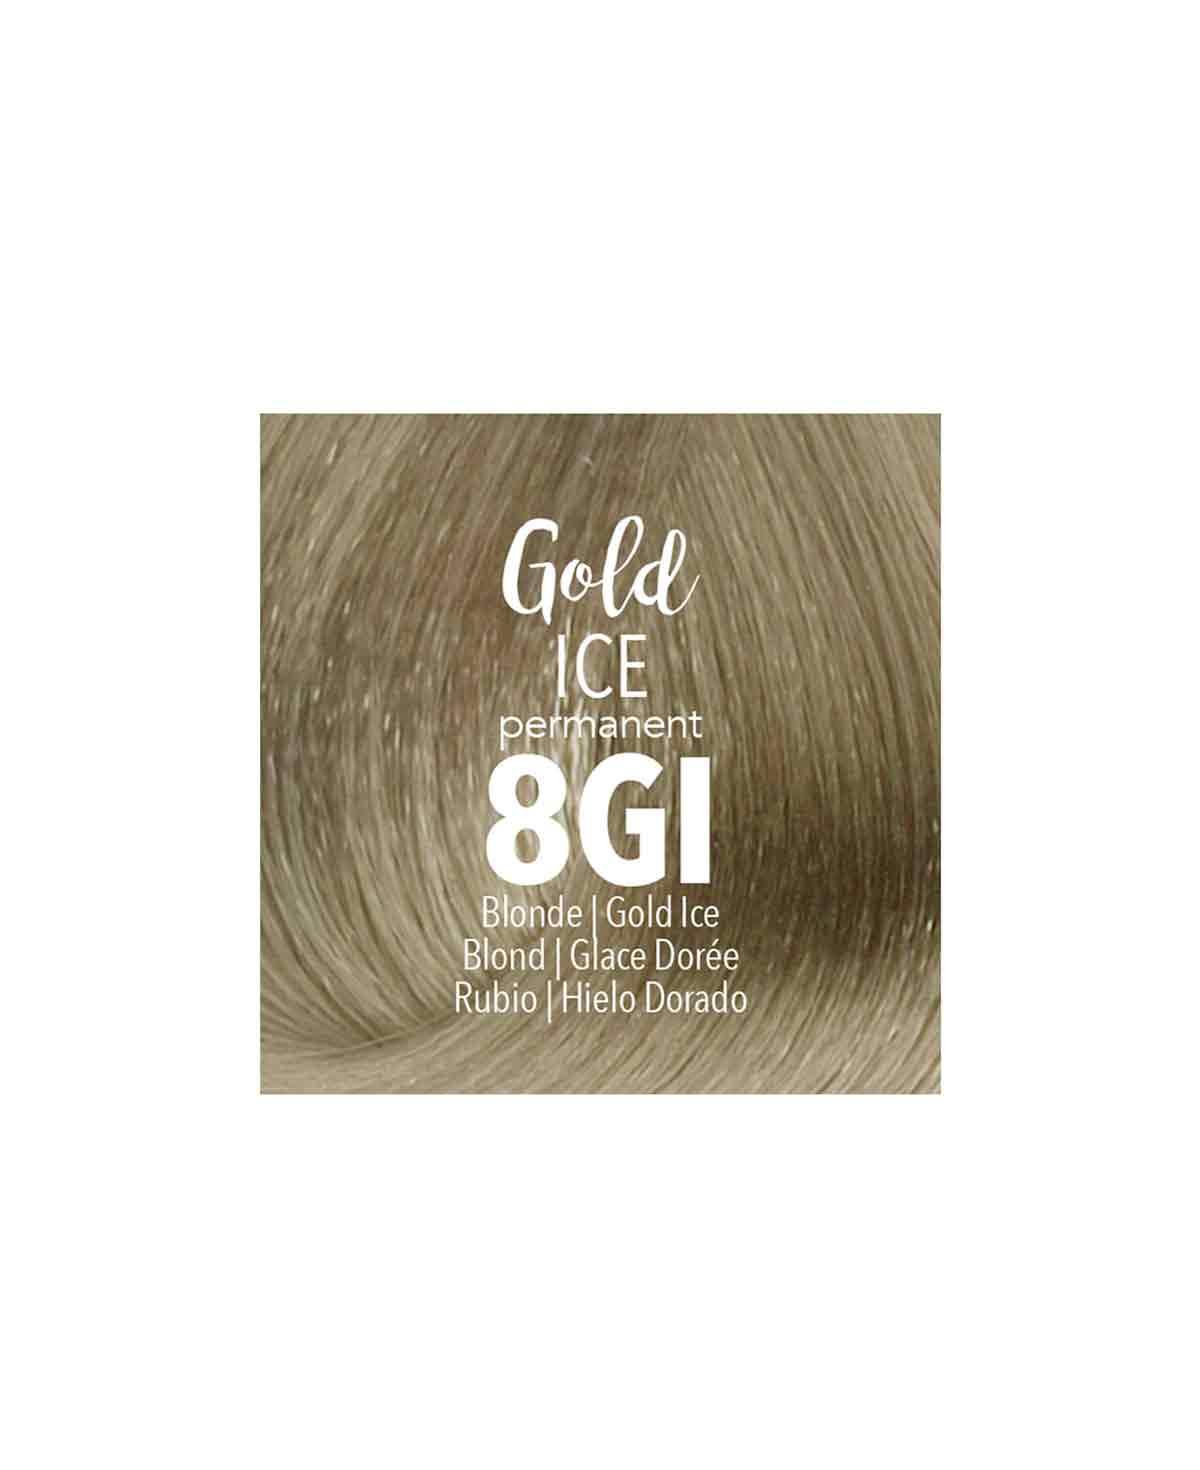 Mydentity - 8GI Blonde Gold Ice